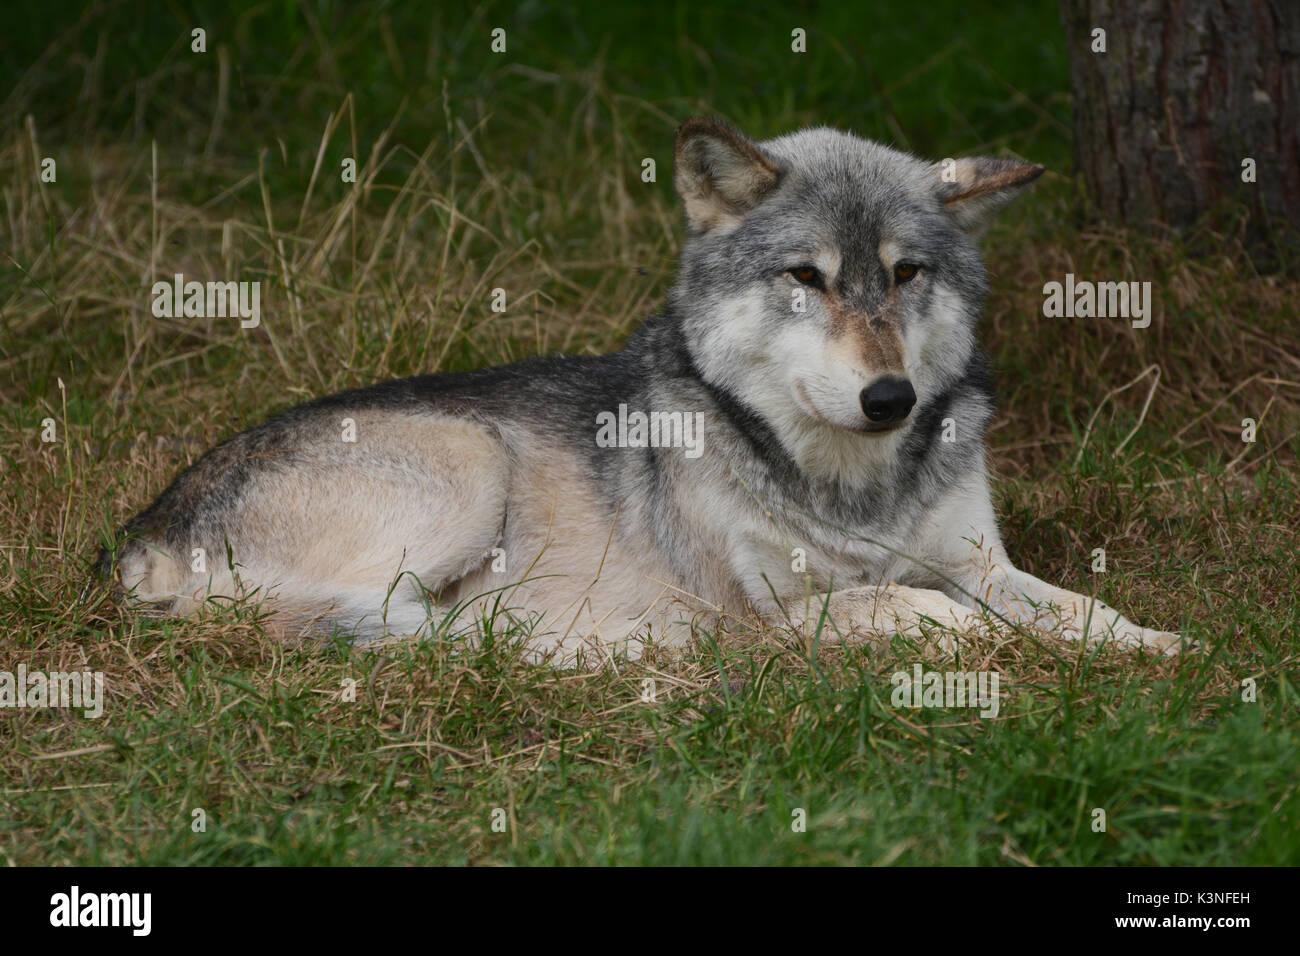 Wolf - Stock Image